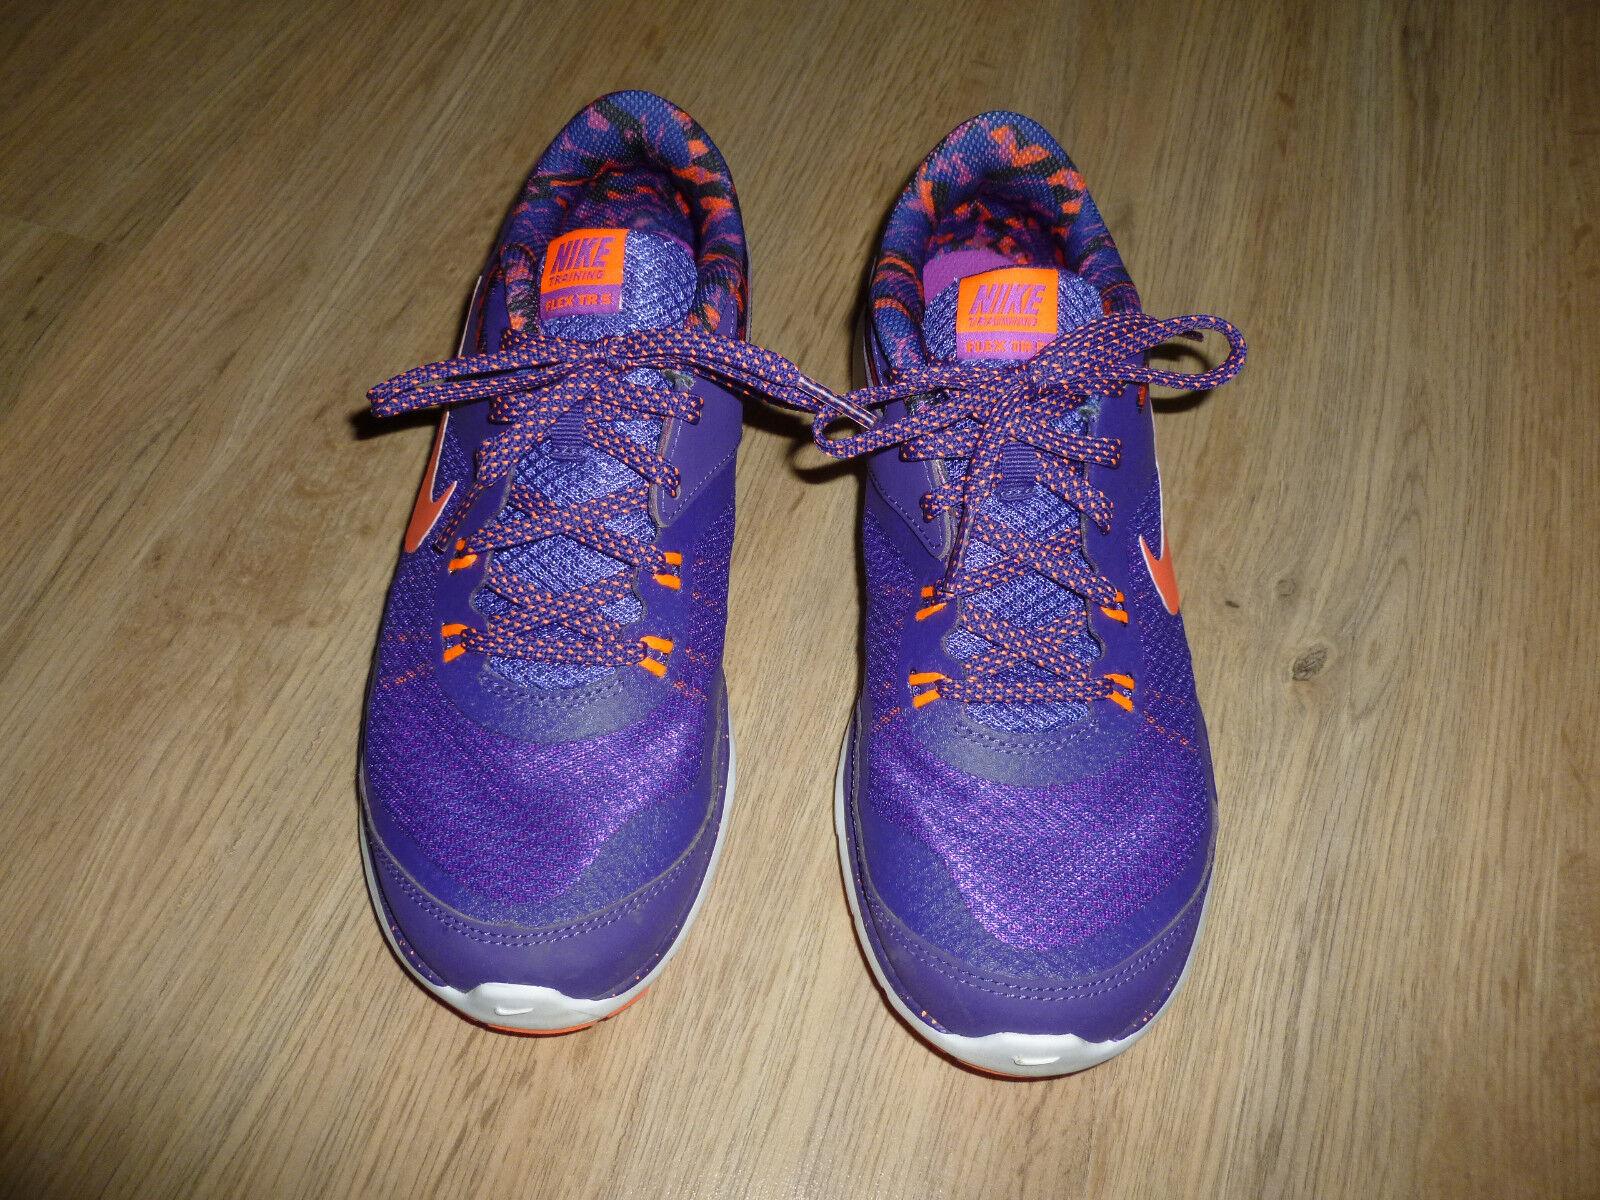 Nike Zapatillas de deporte púrpura Flex TR  5 38,5  deportes calientes